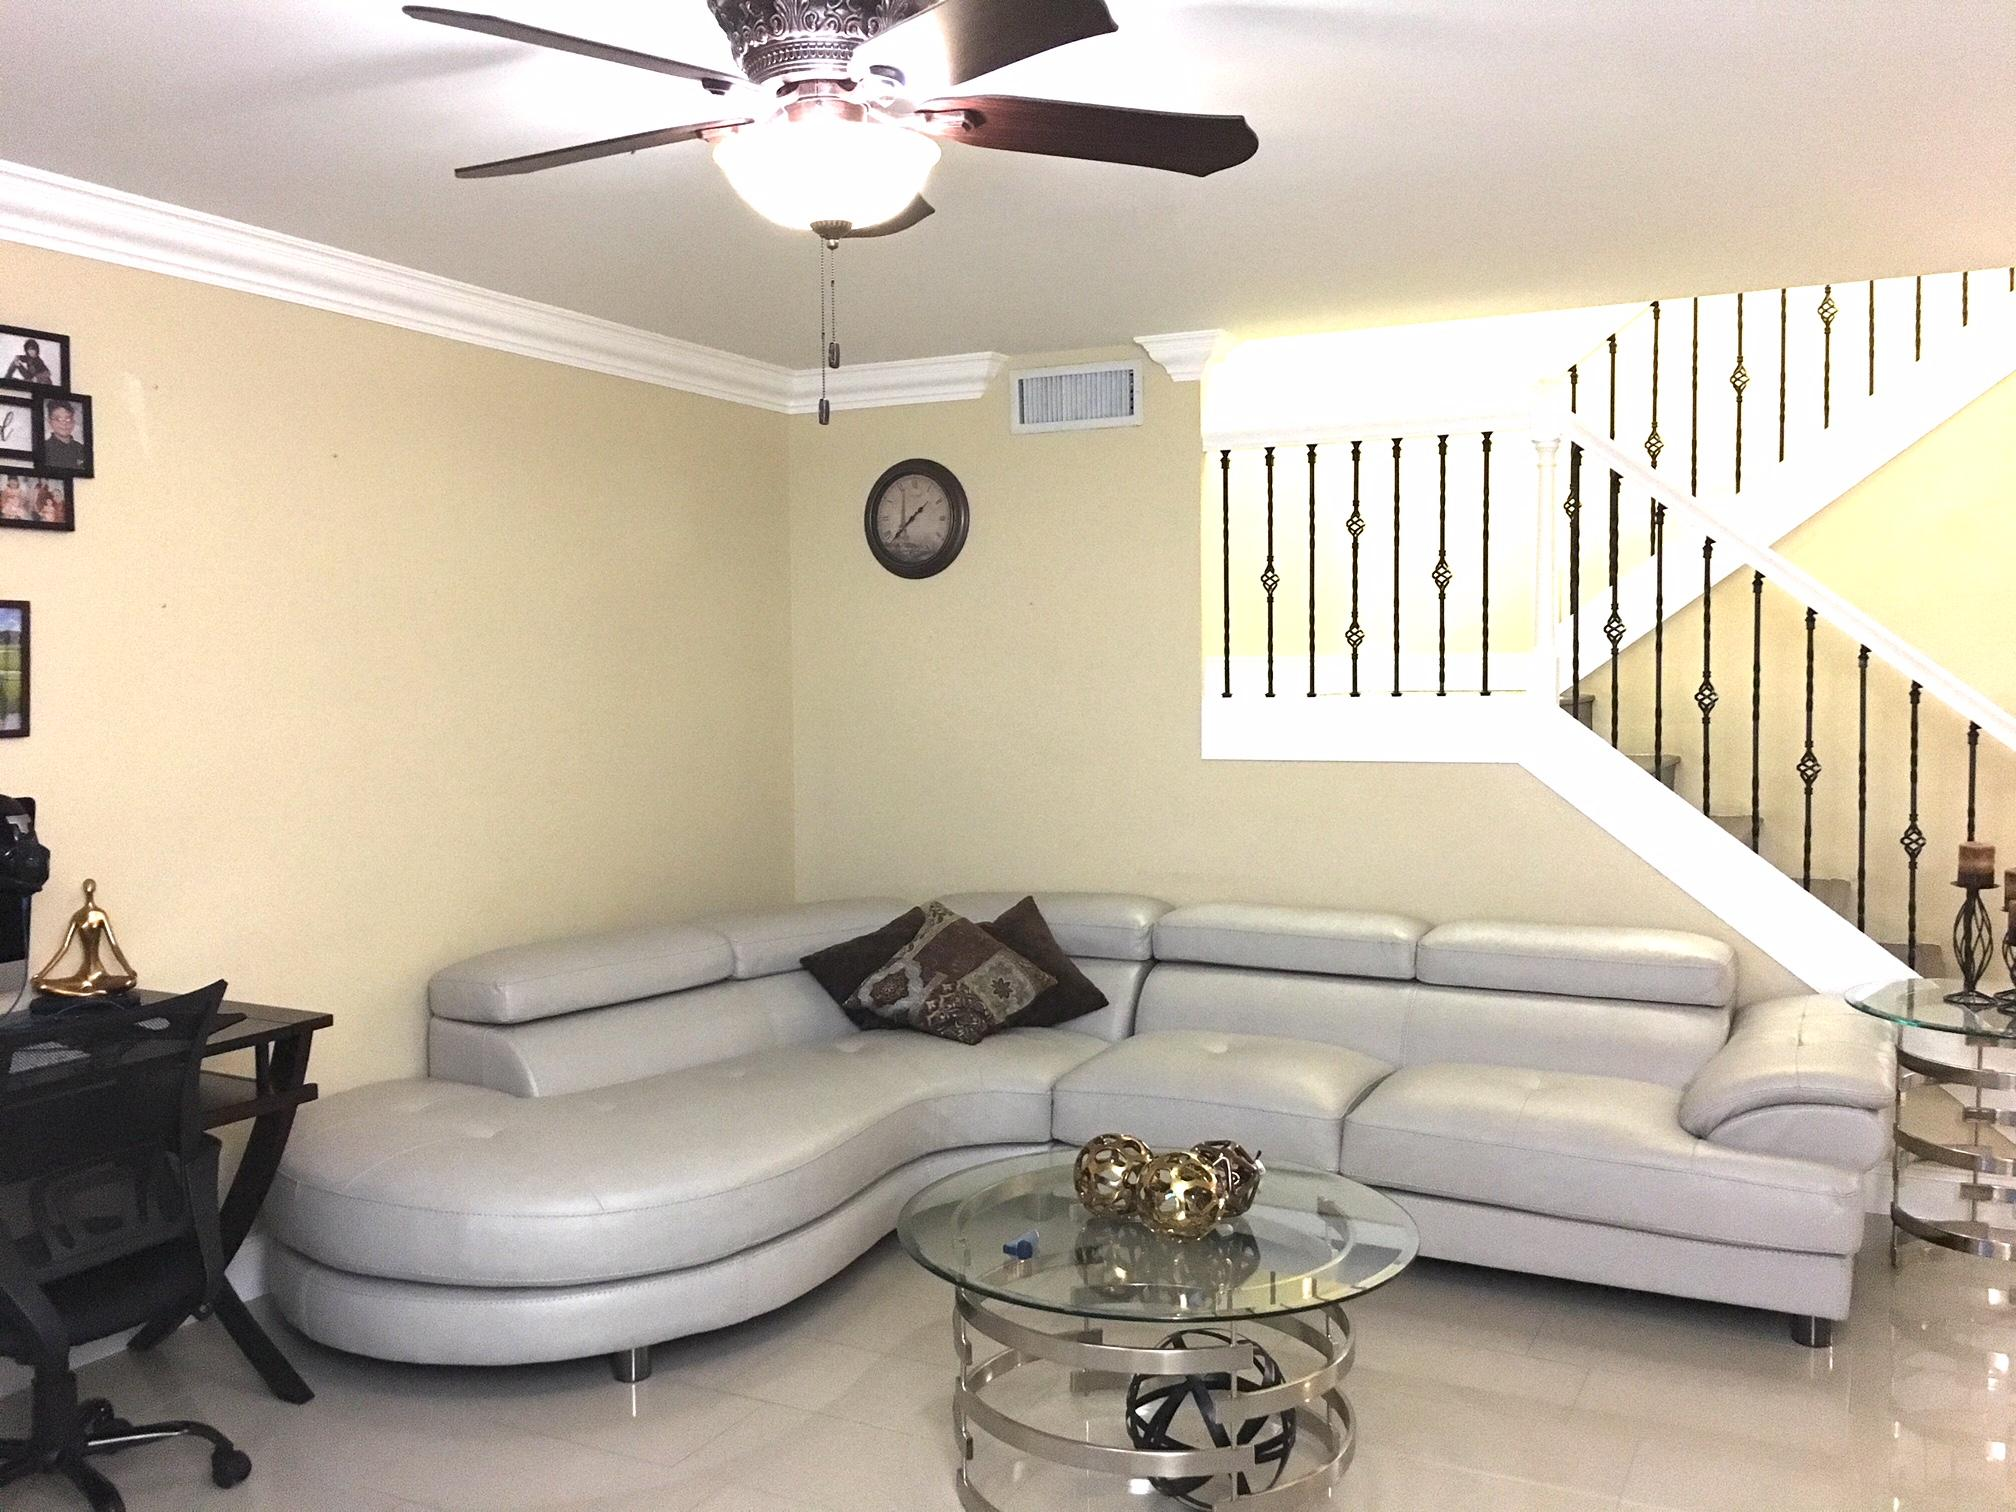 West Palm Beach, FL 33406